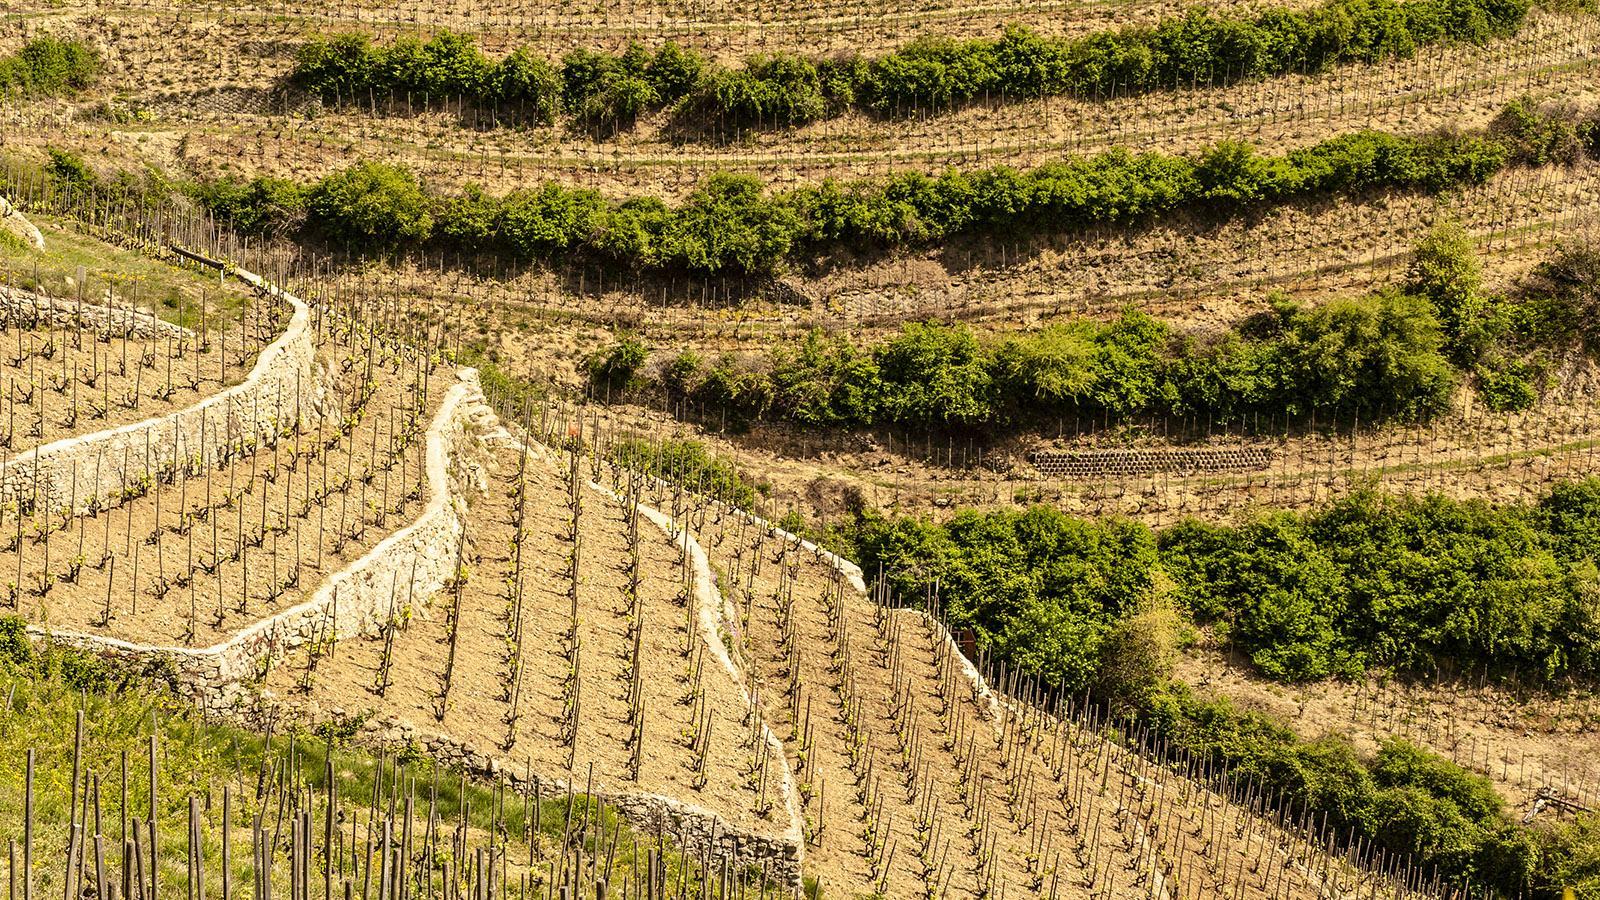 Terrassenbau in den Côtes du Rhône. Foto: Hilke Maunder